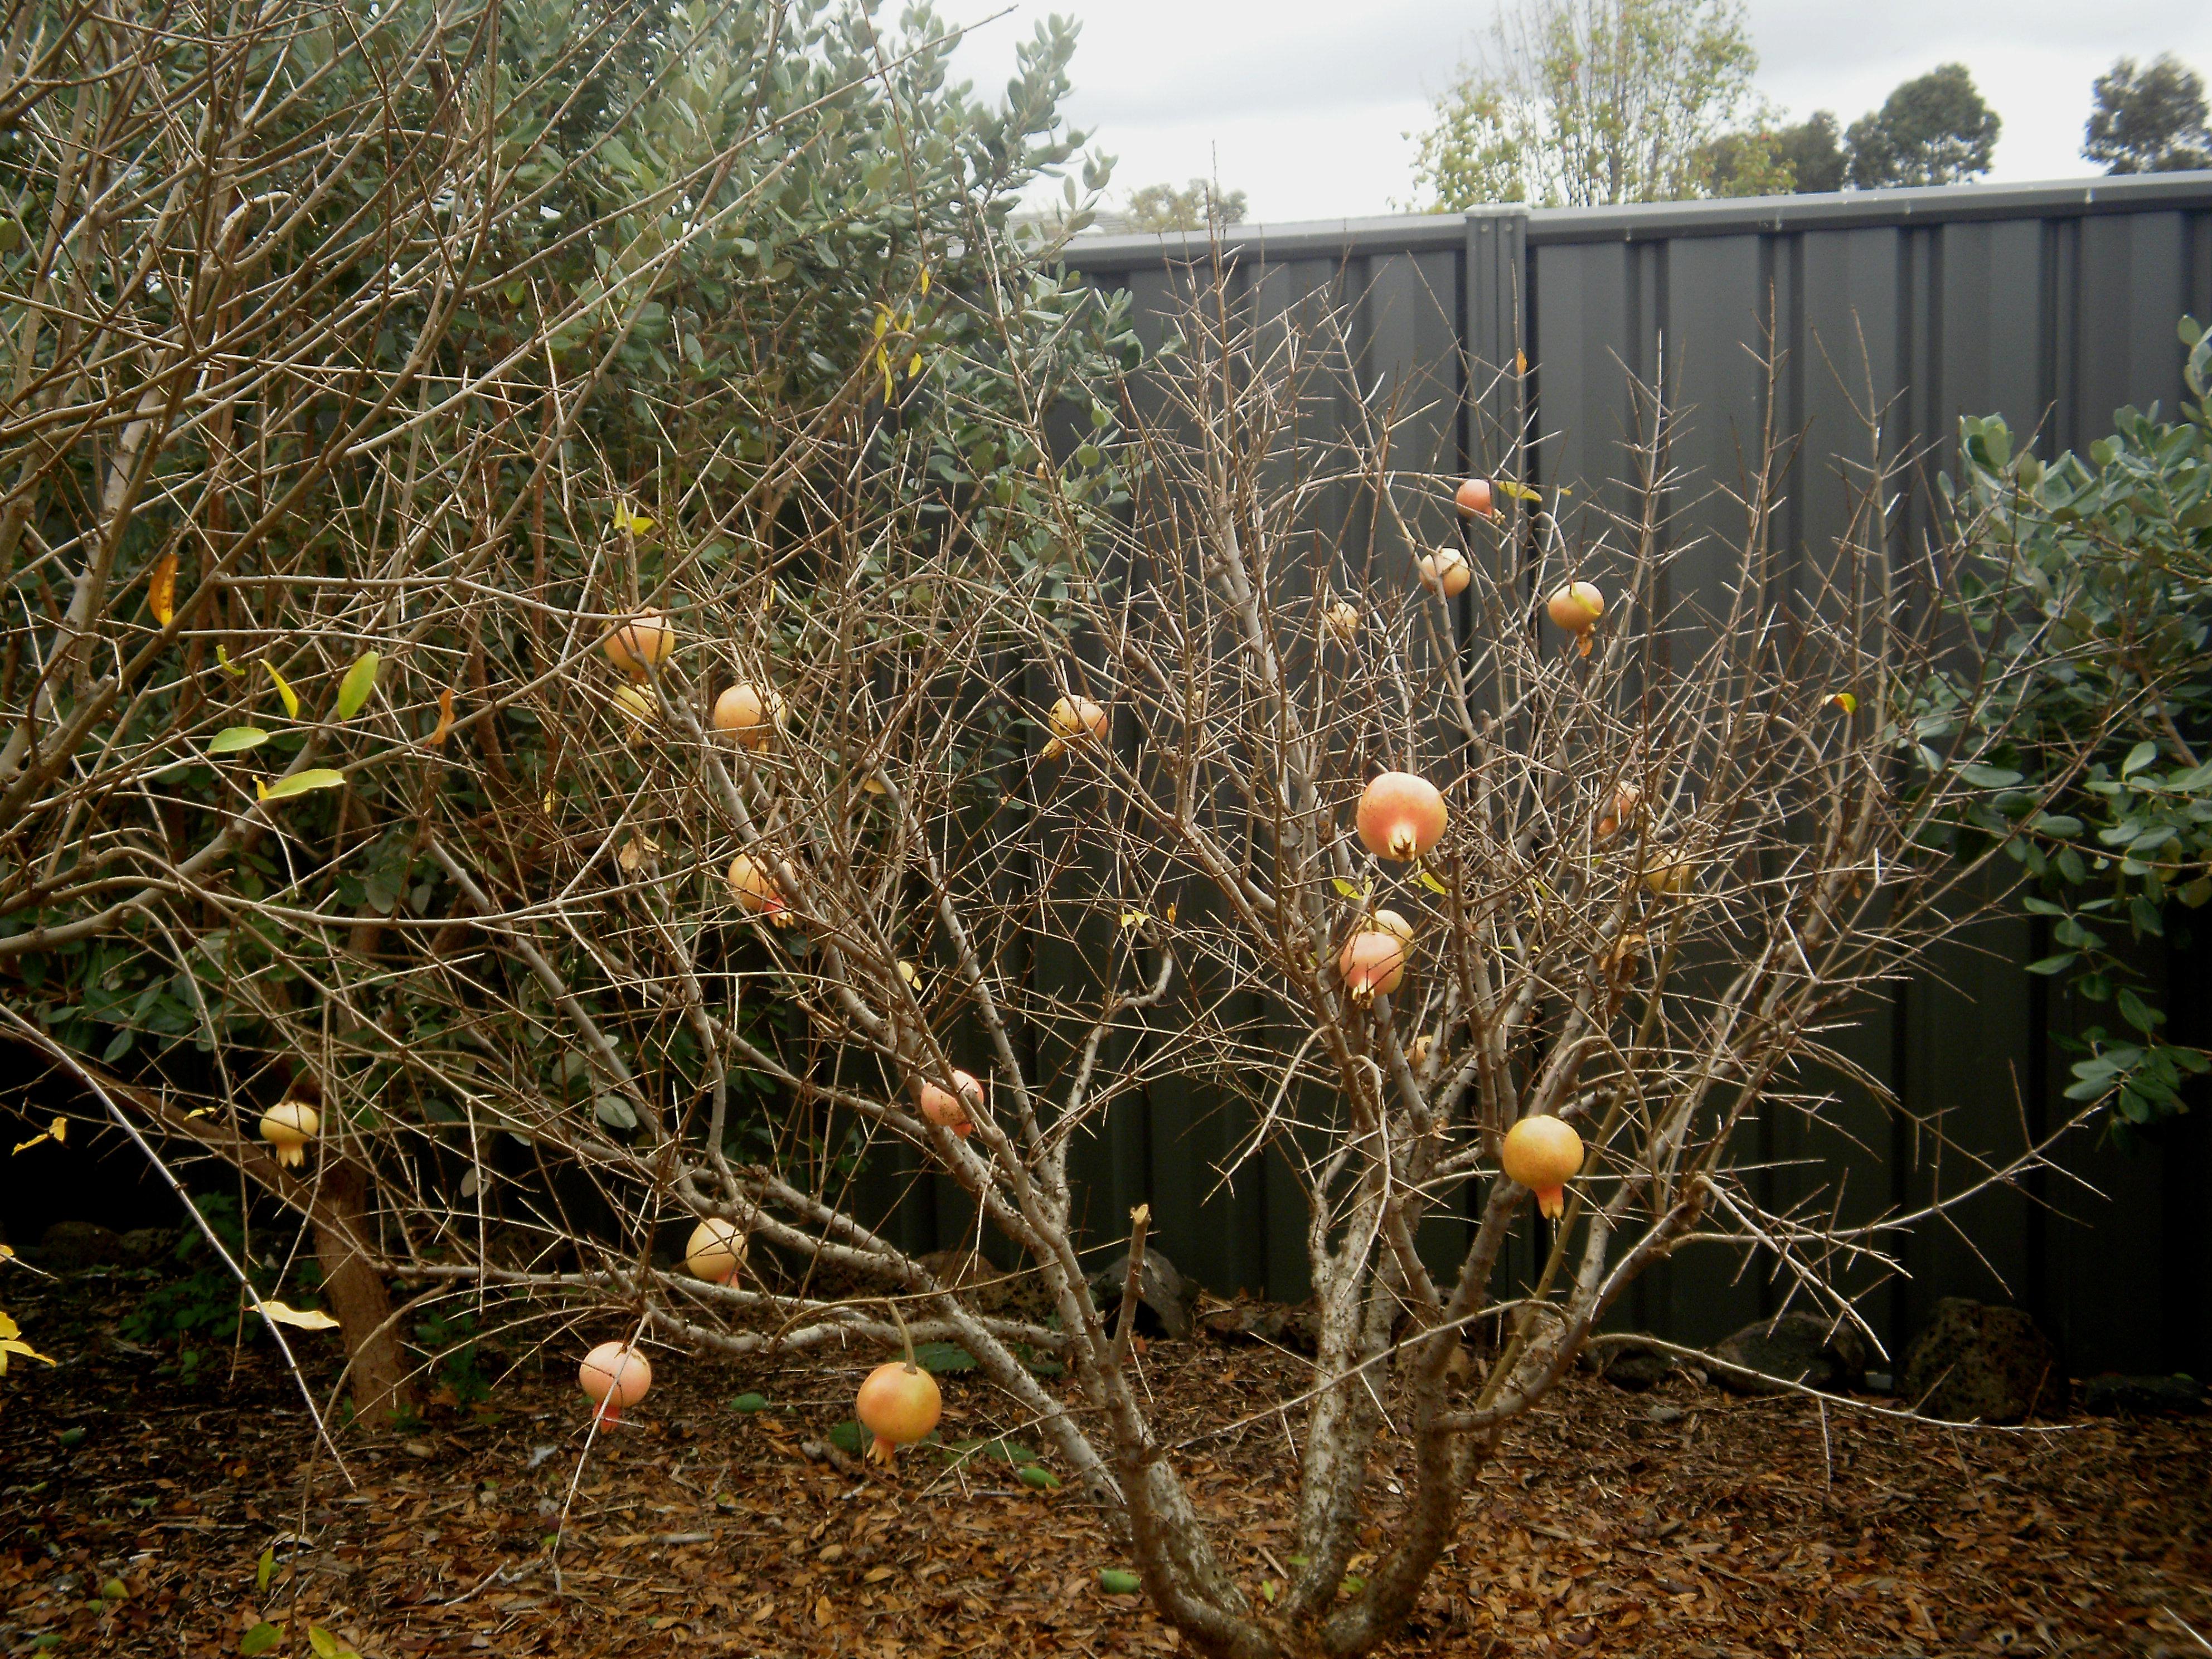 winter garden anne frandi coory